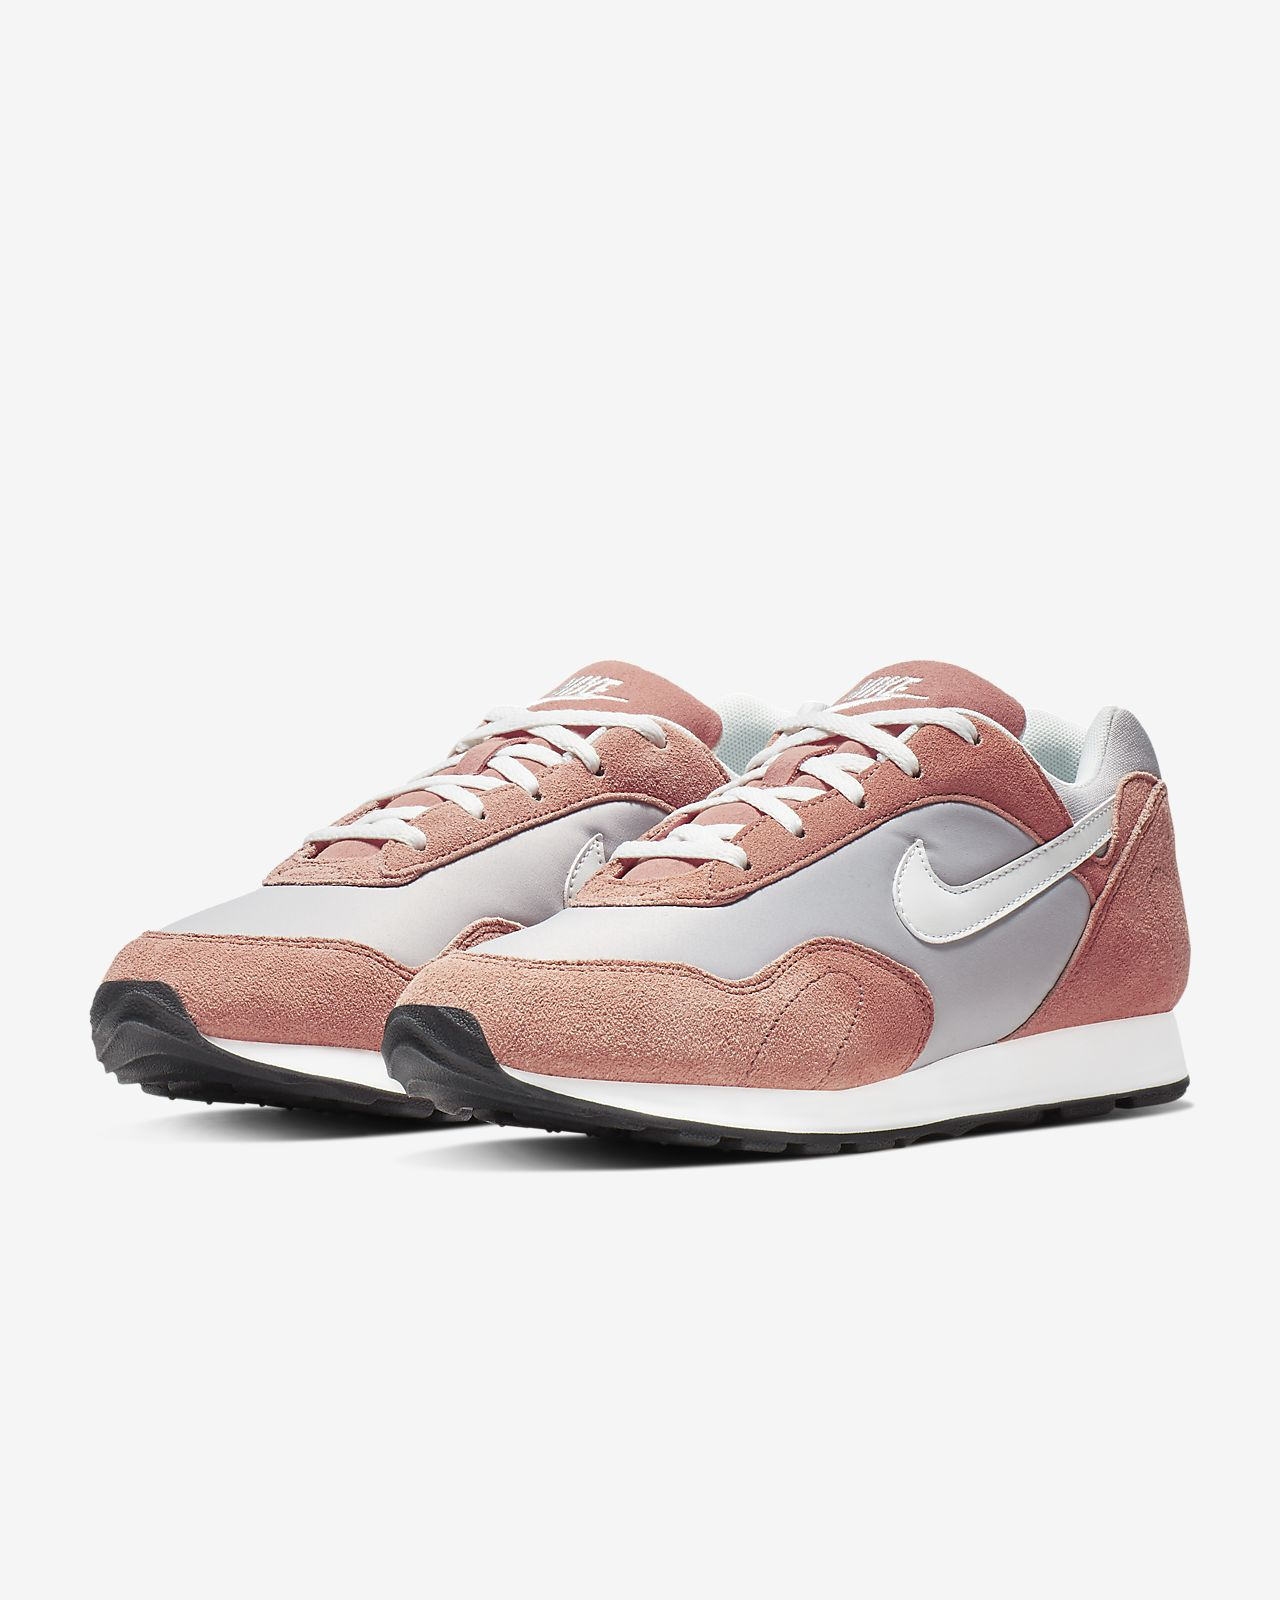 16249937a10 Low Resolution Nike Outburst Women s Shoe Nike Outburst Women s Shoe